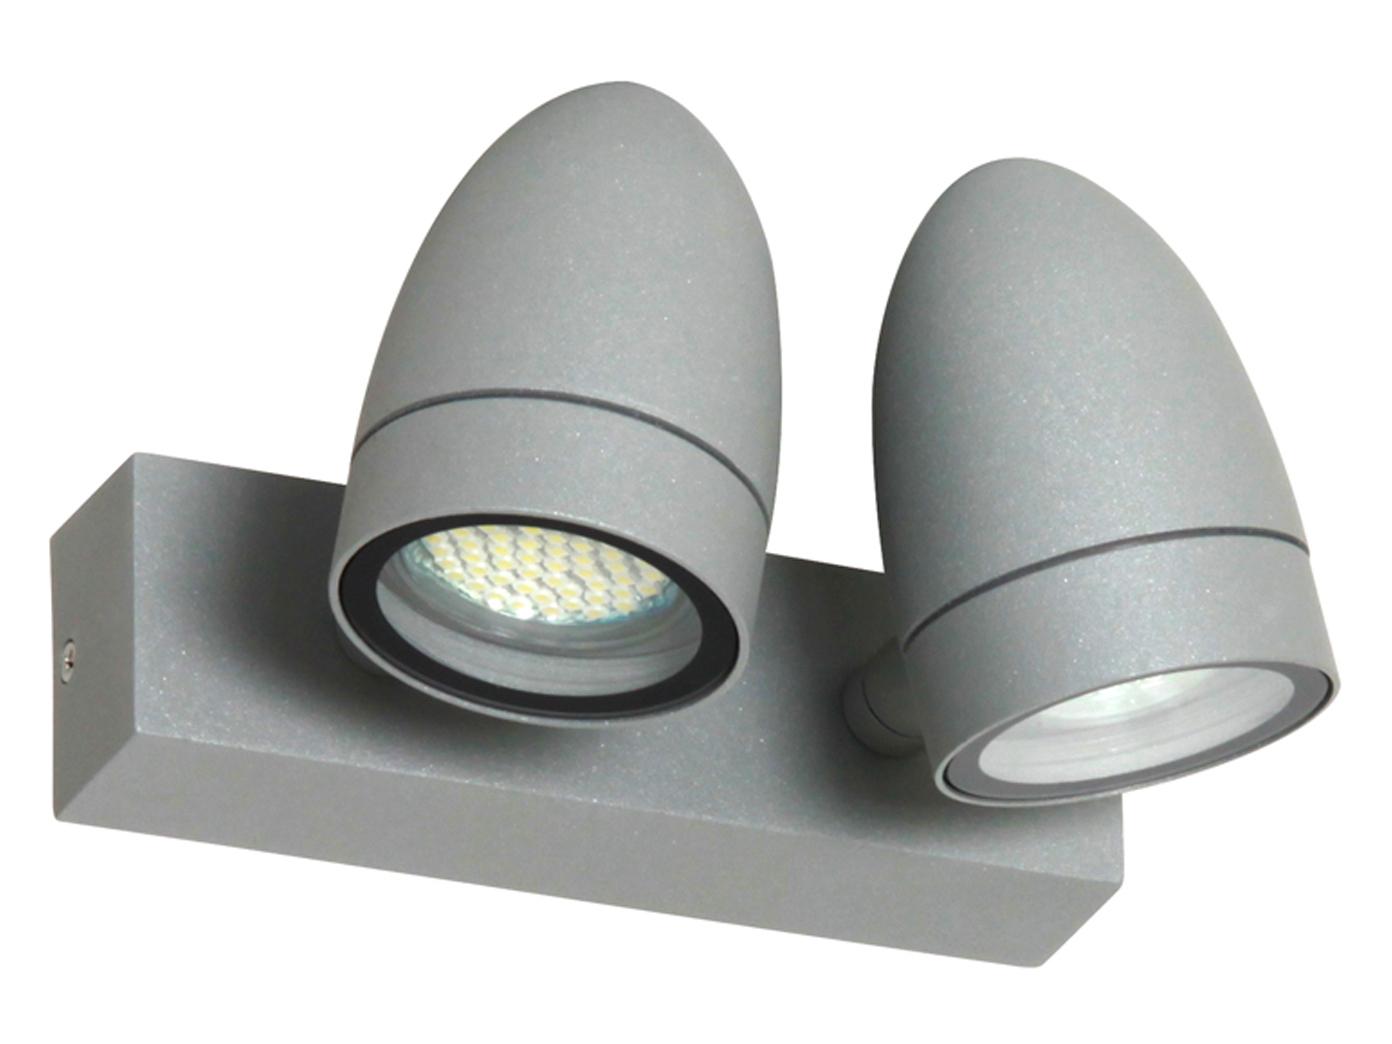 Led Doppelwandleuchte Aluminium Grau Ip54 Strahler Schwenkbar